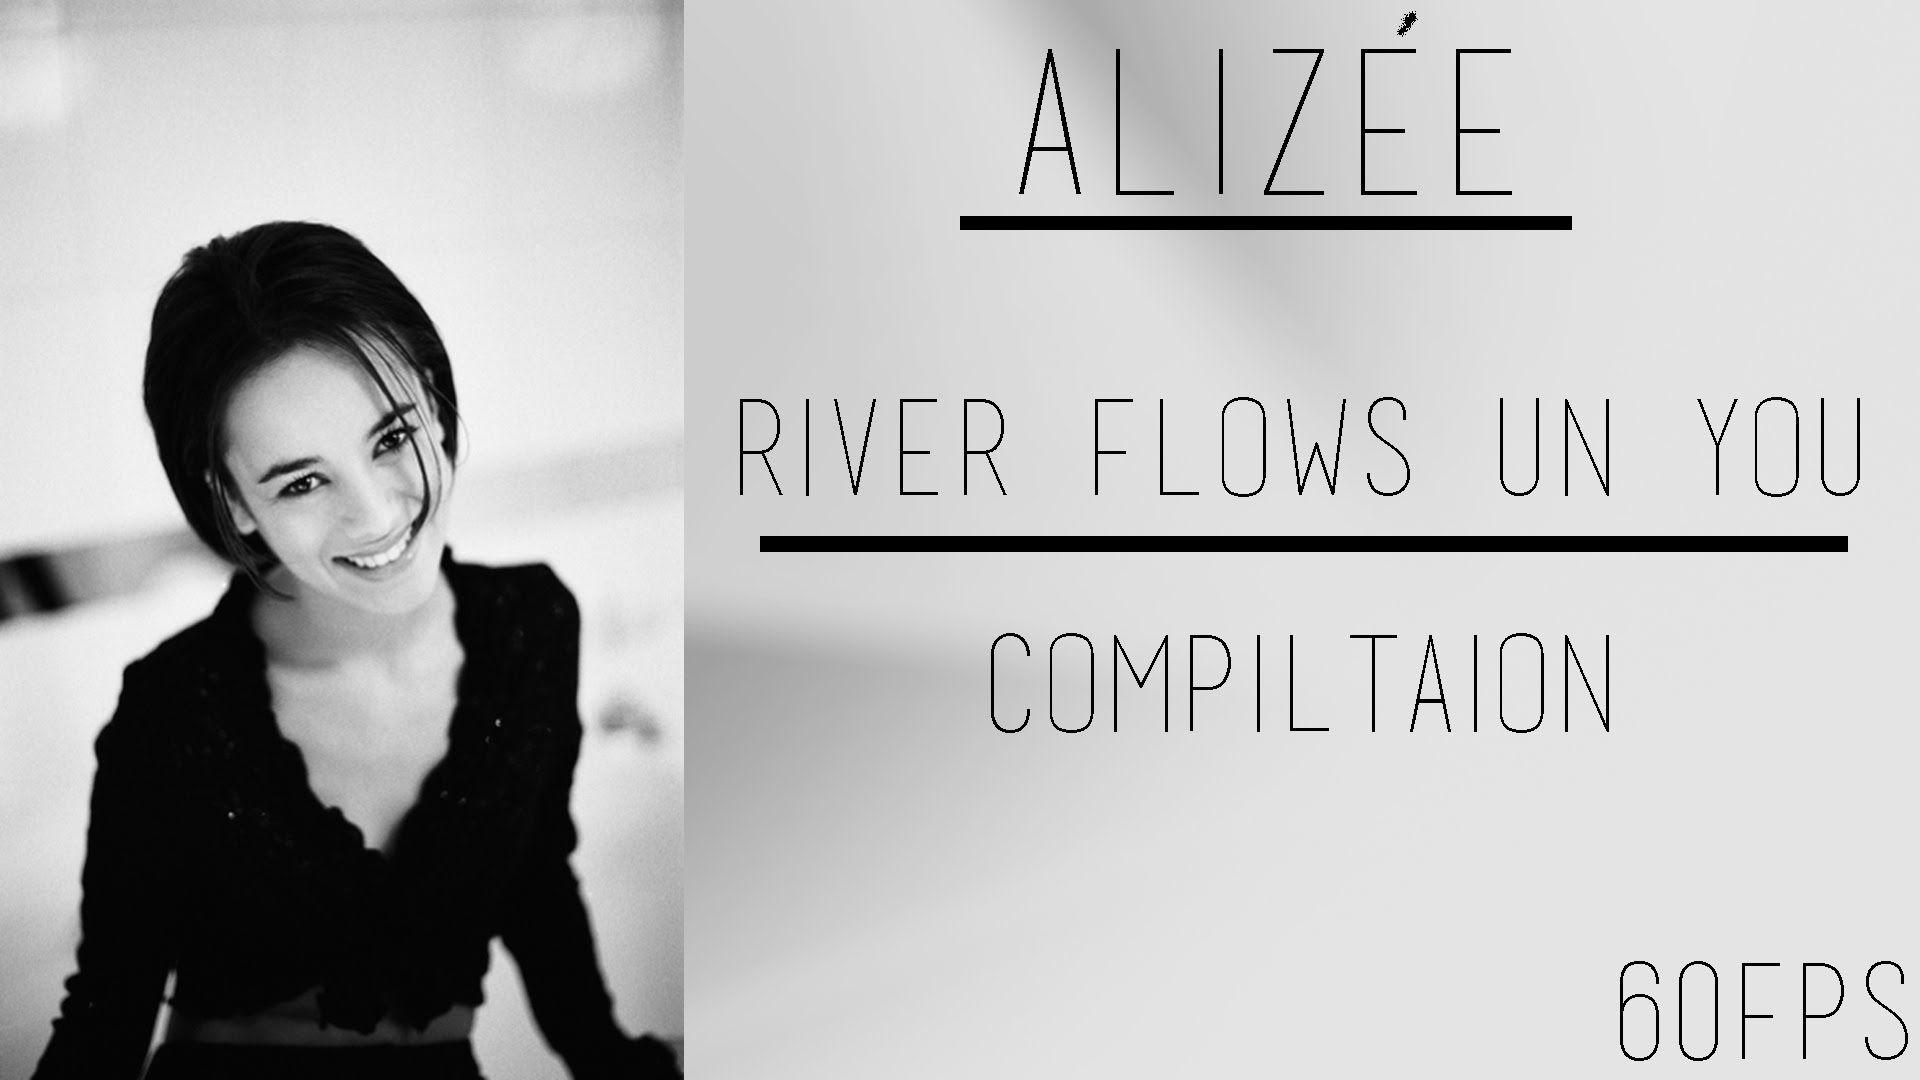 ᴴᴰ[60FPS] Alizée - River Flows In You - Remastered Compilation [1080p]